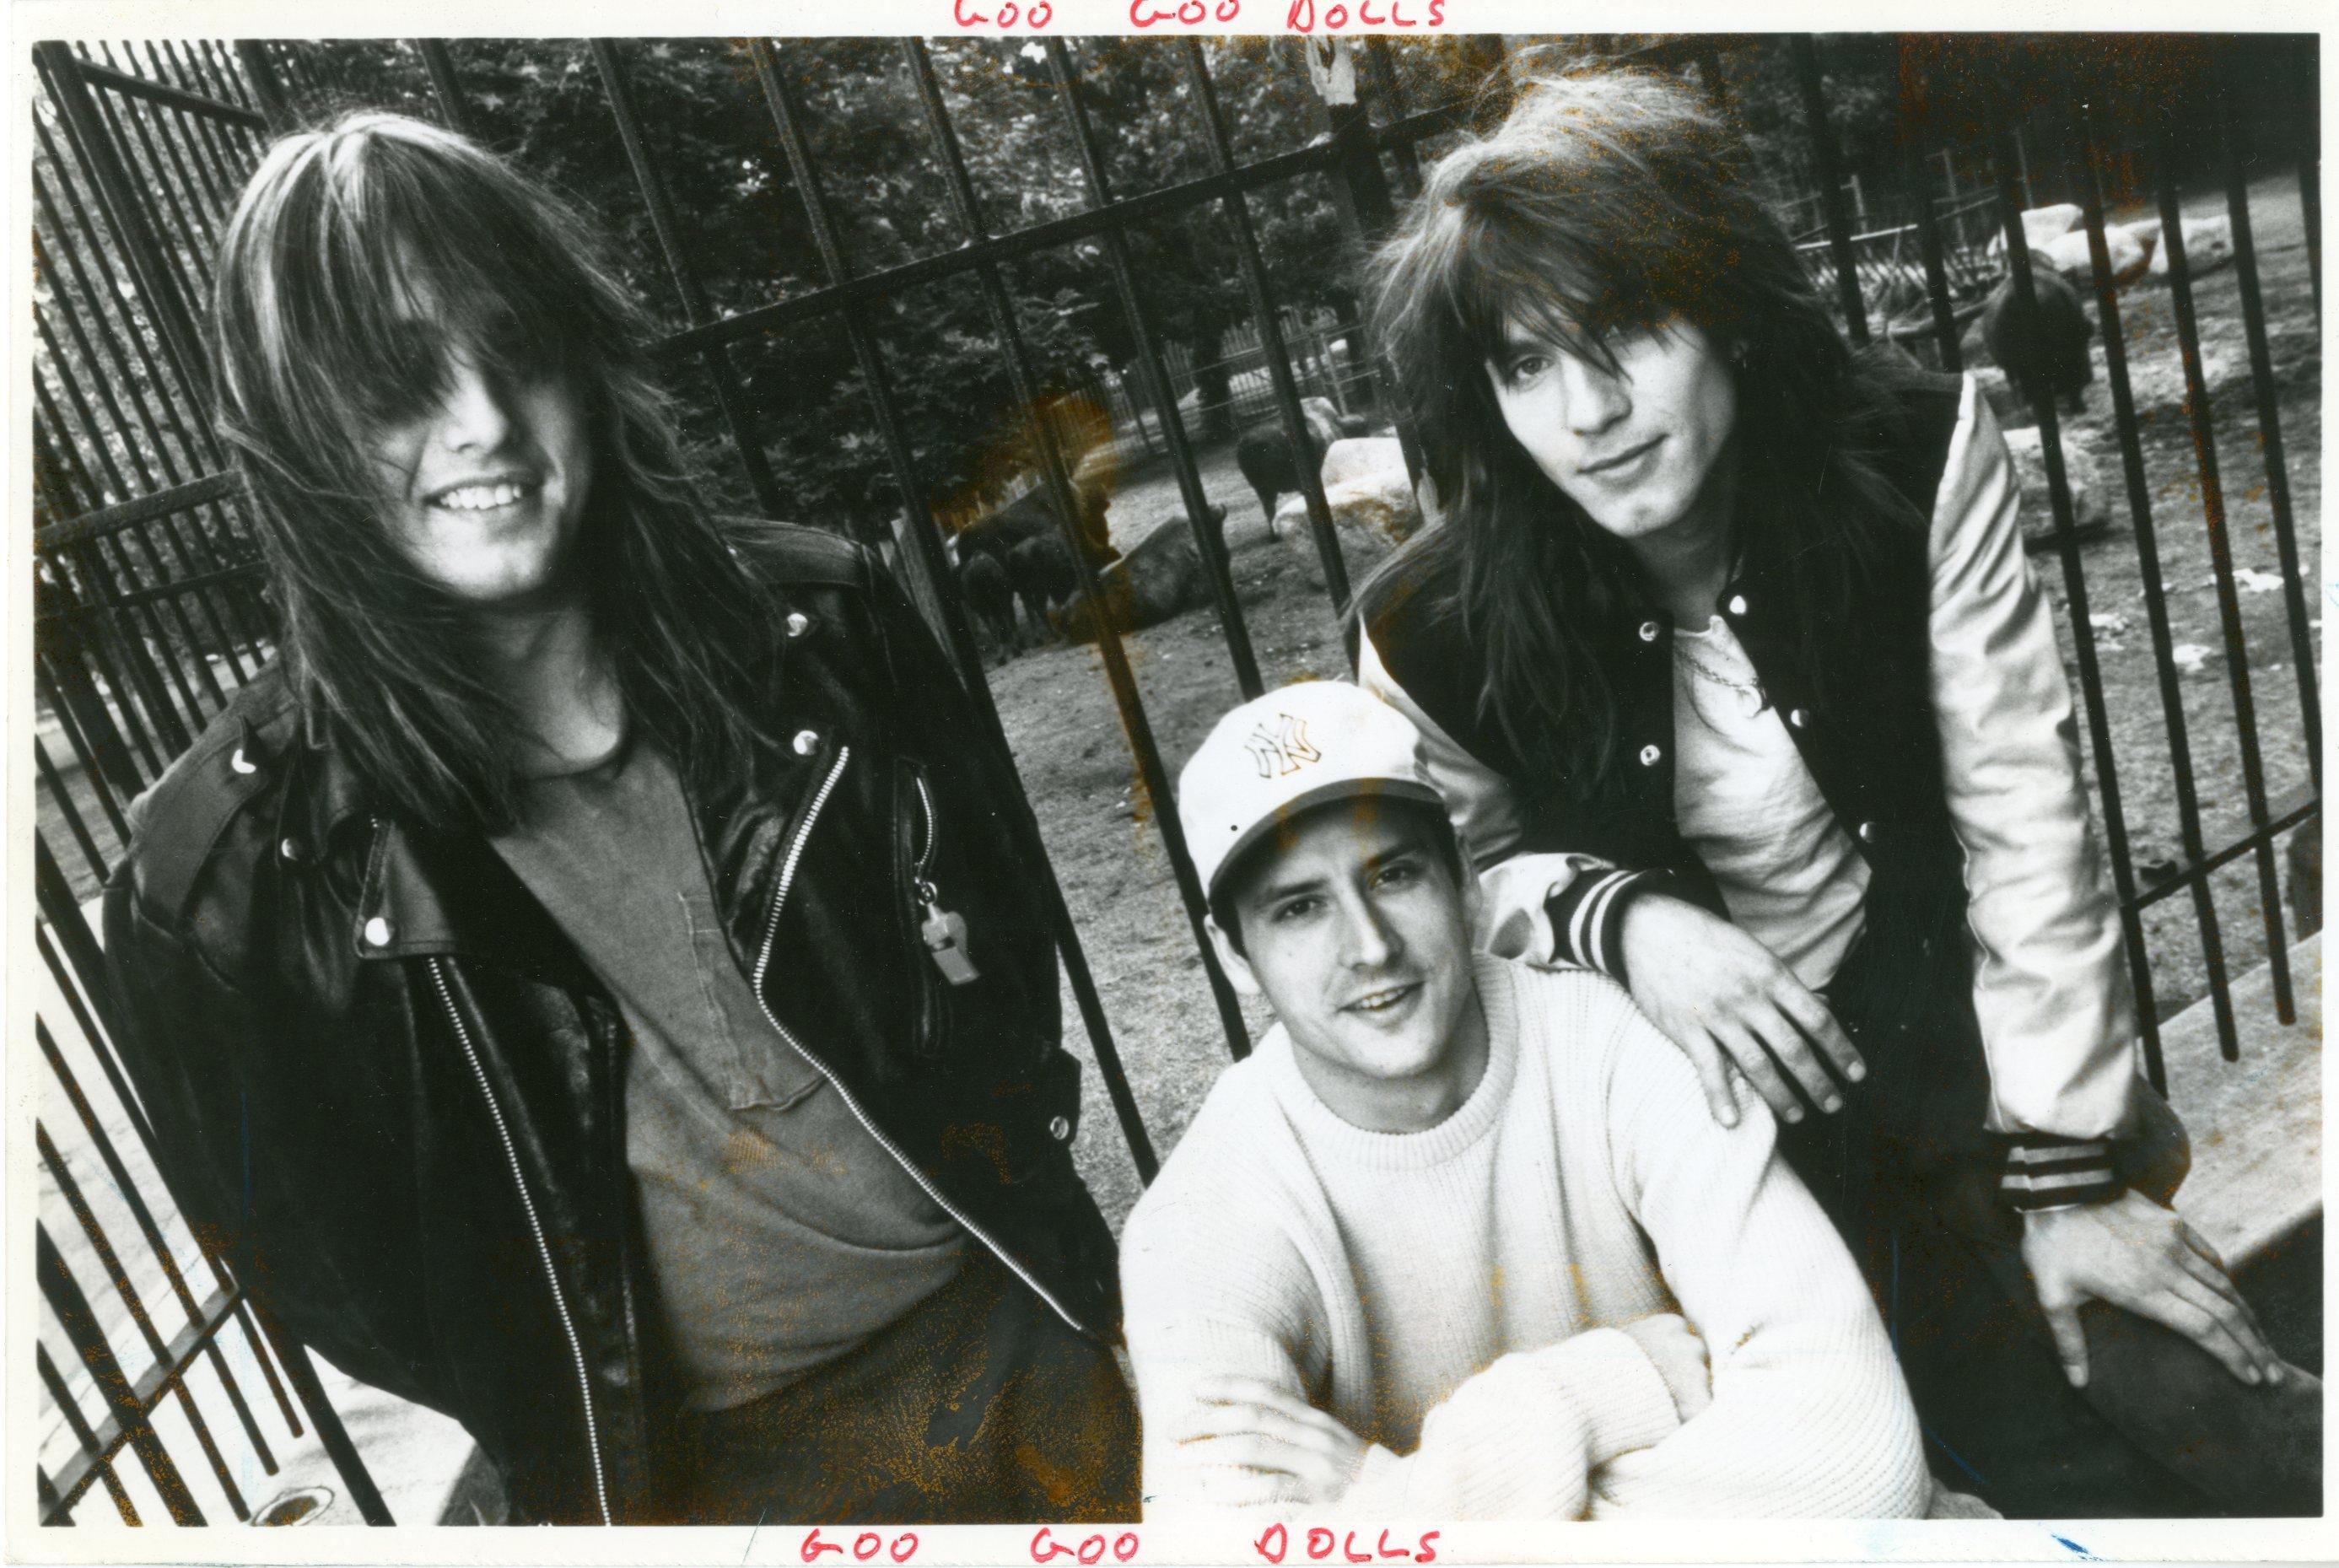 This publicity photo of the Goo Goo Dolls ran in The Buffalo News on Jan. 3, 1994.